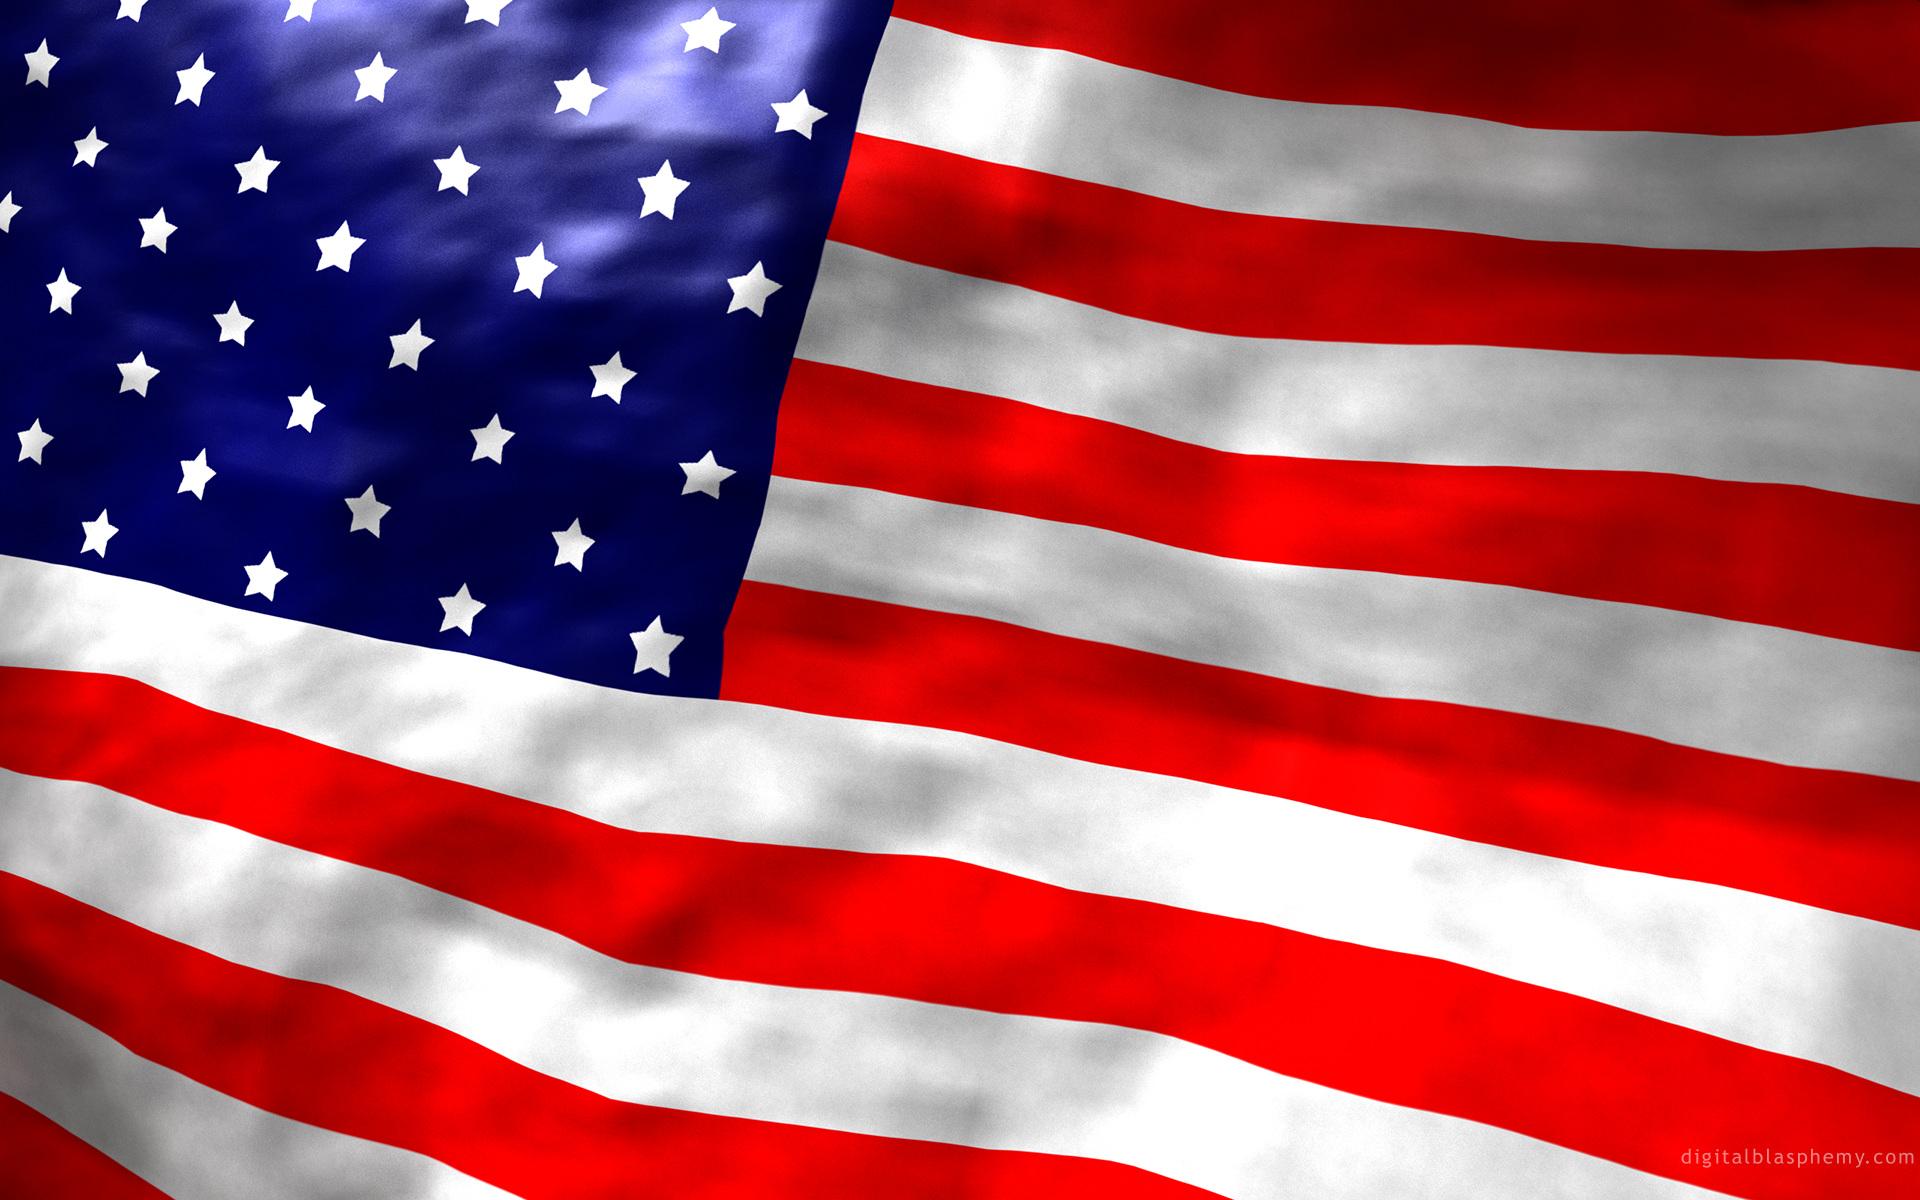 Flags USA Wallpaper 1920x1200 Flags USA American Flag 1920x1200